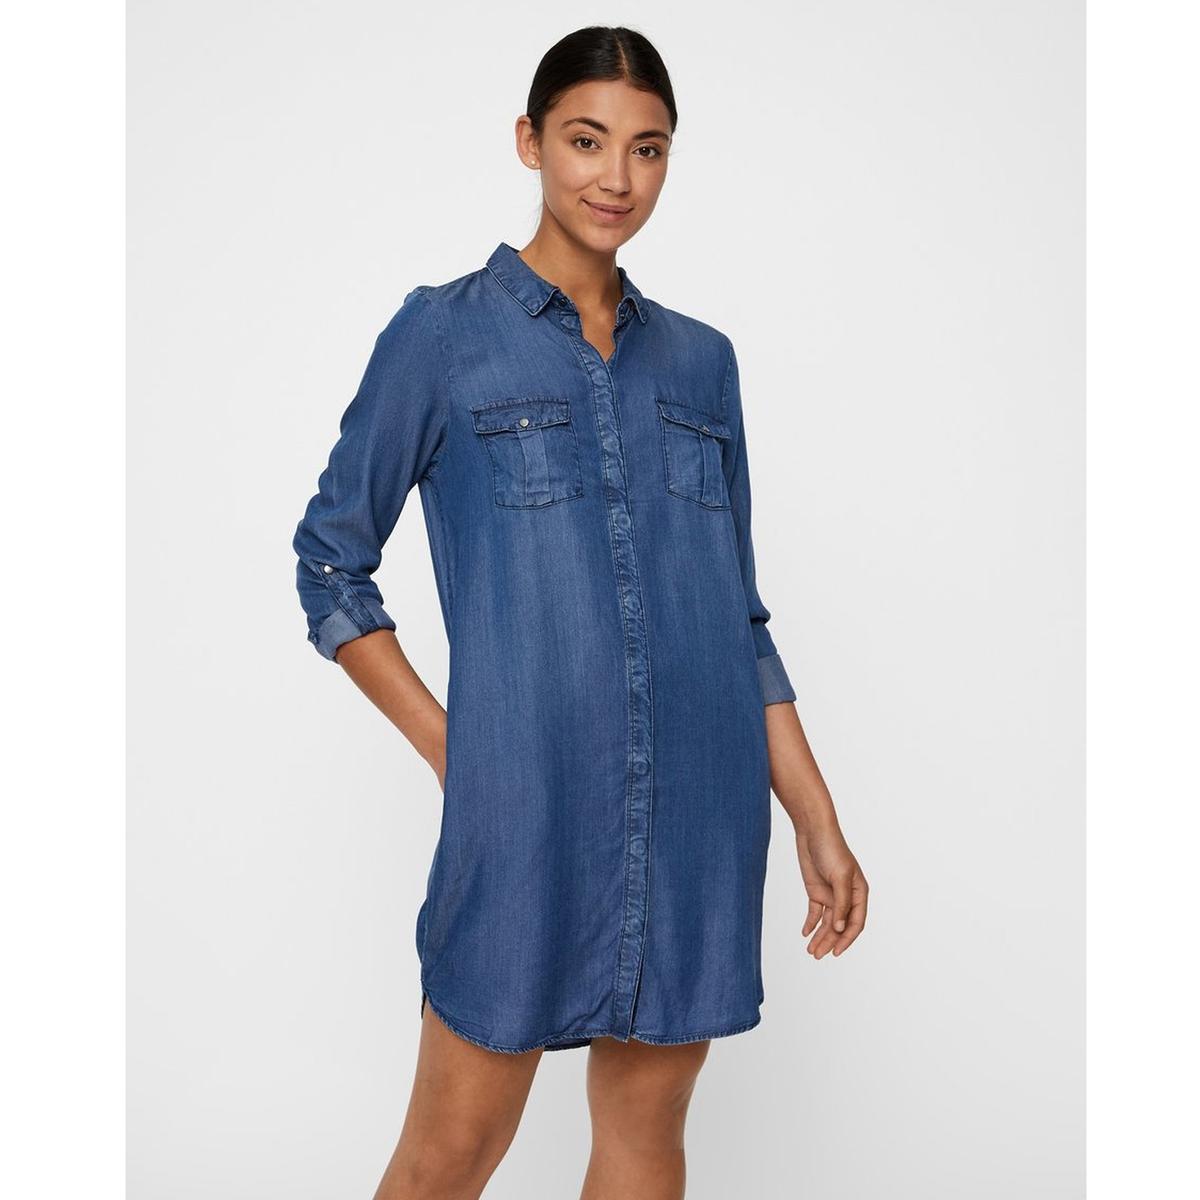 цена Платье-рубашка La Redoute Джинсовое XS синий онлайн в 2017 году